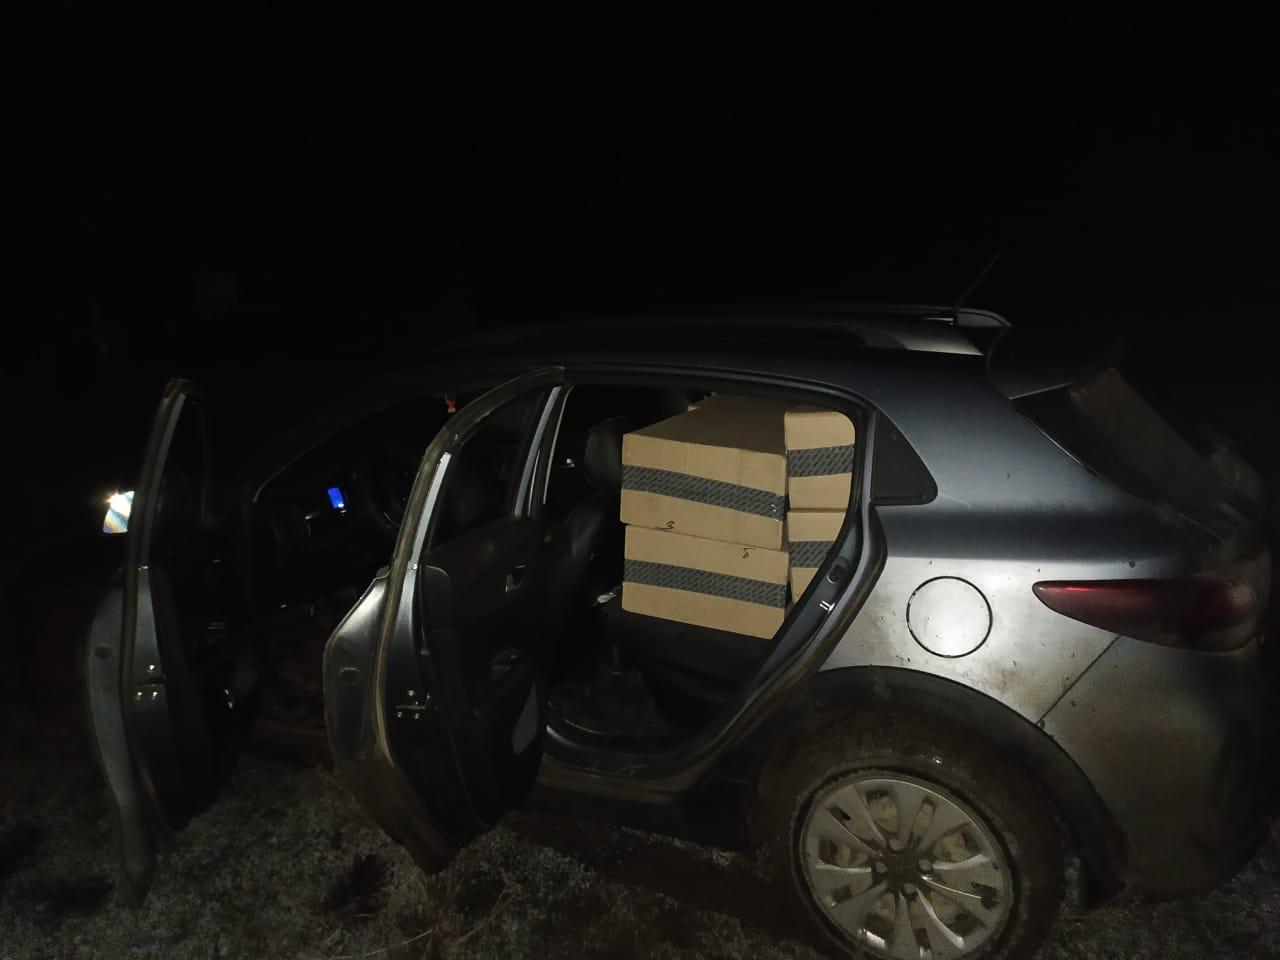 На Дону 10 человек арестованы за контрабанду табака